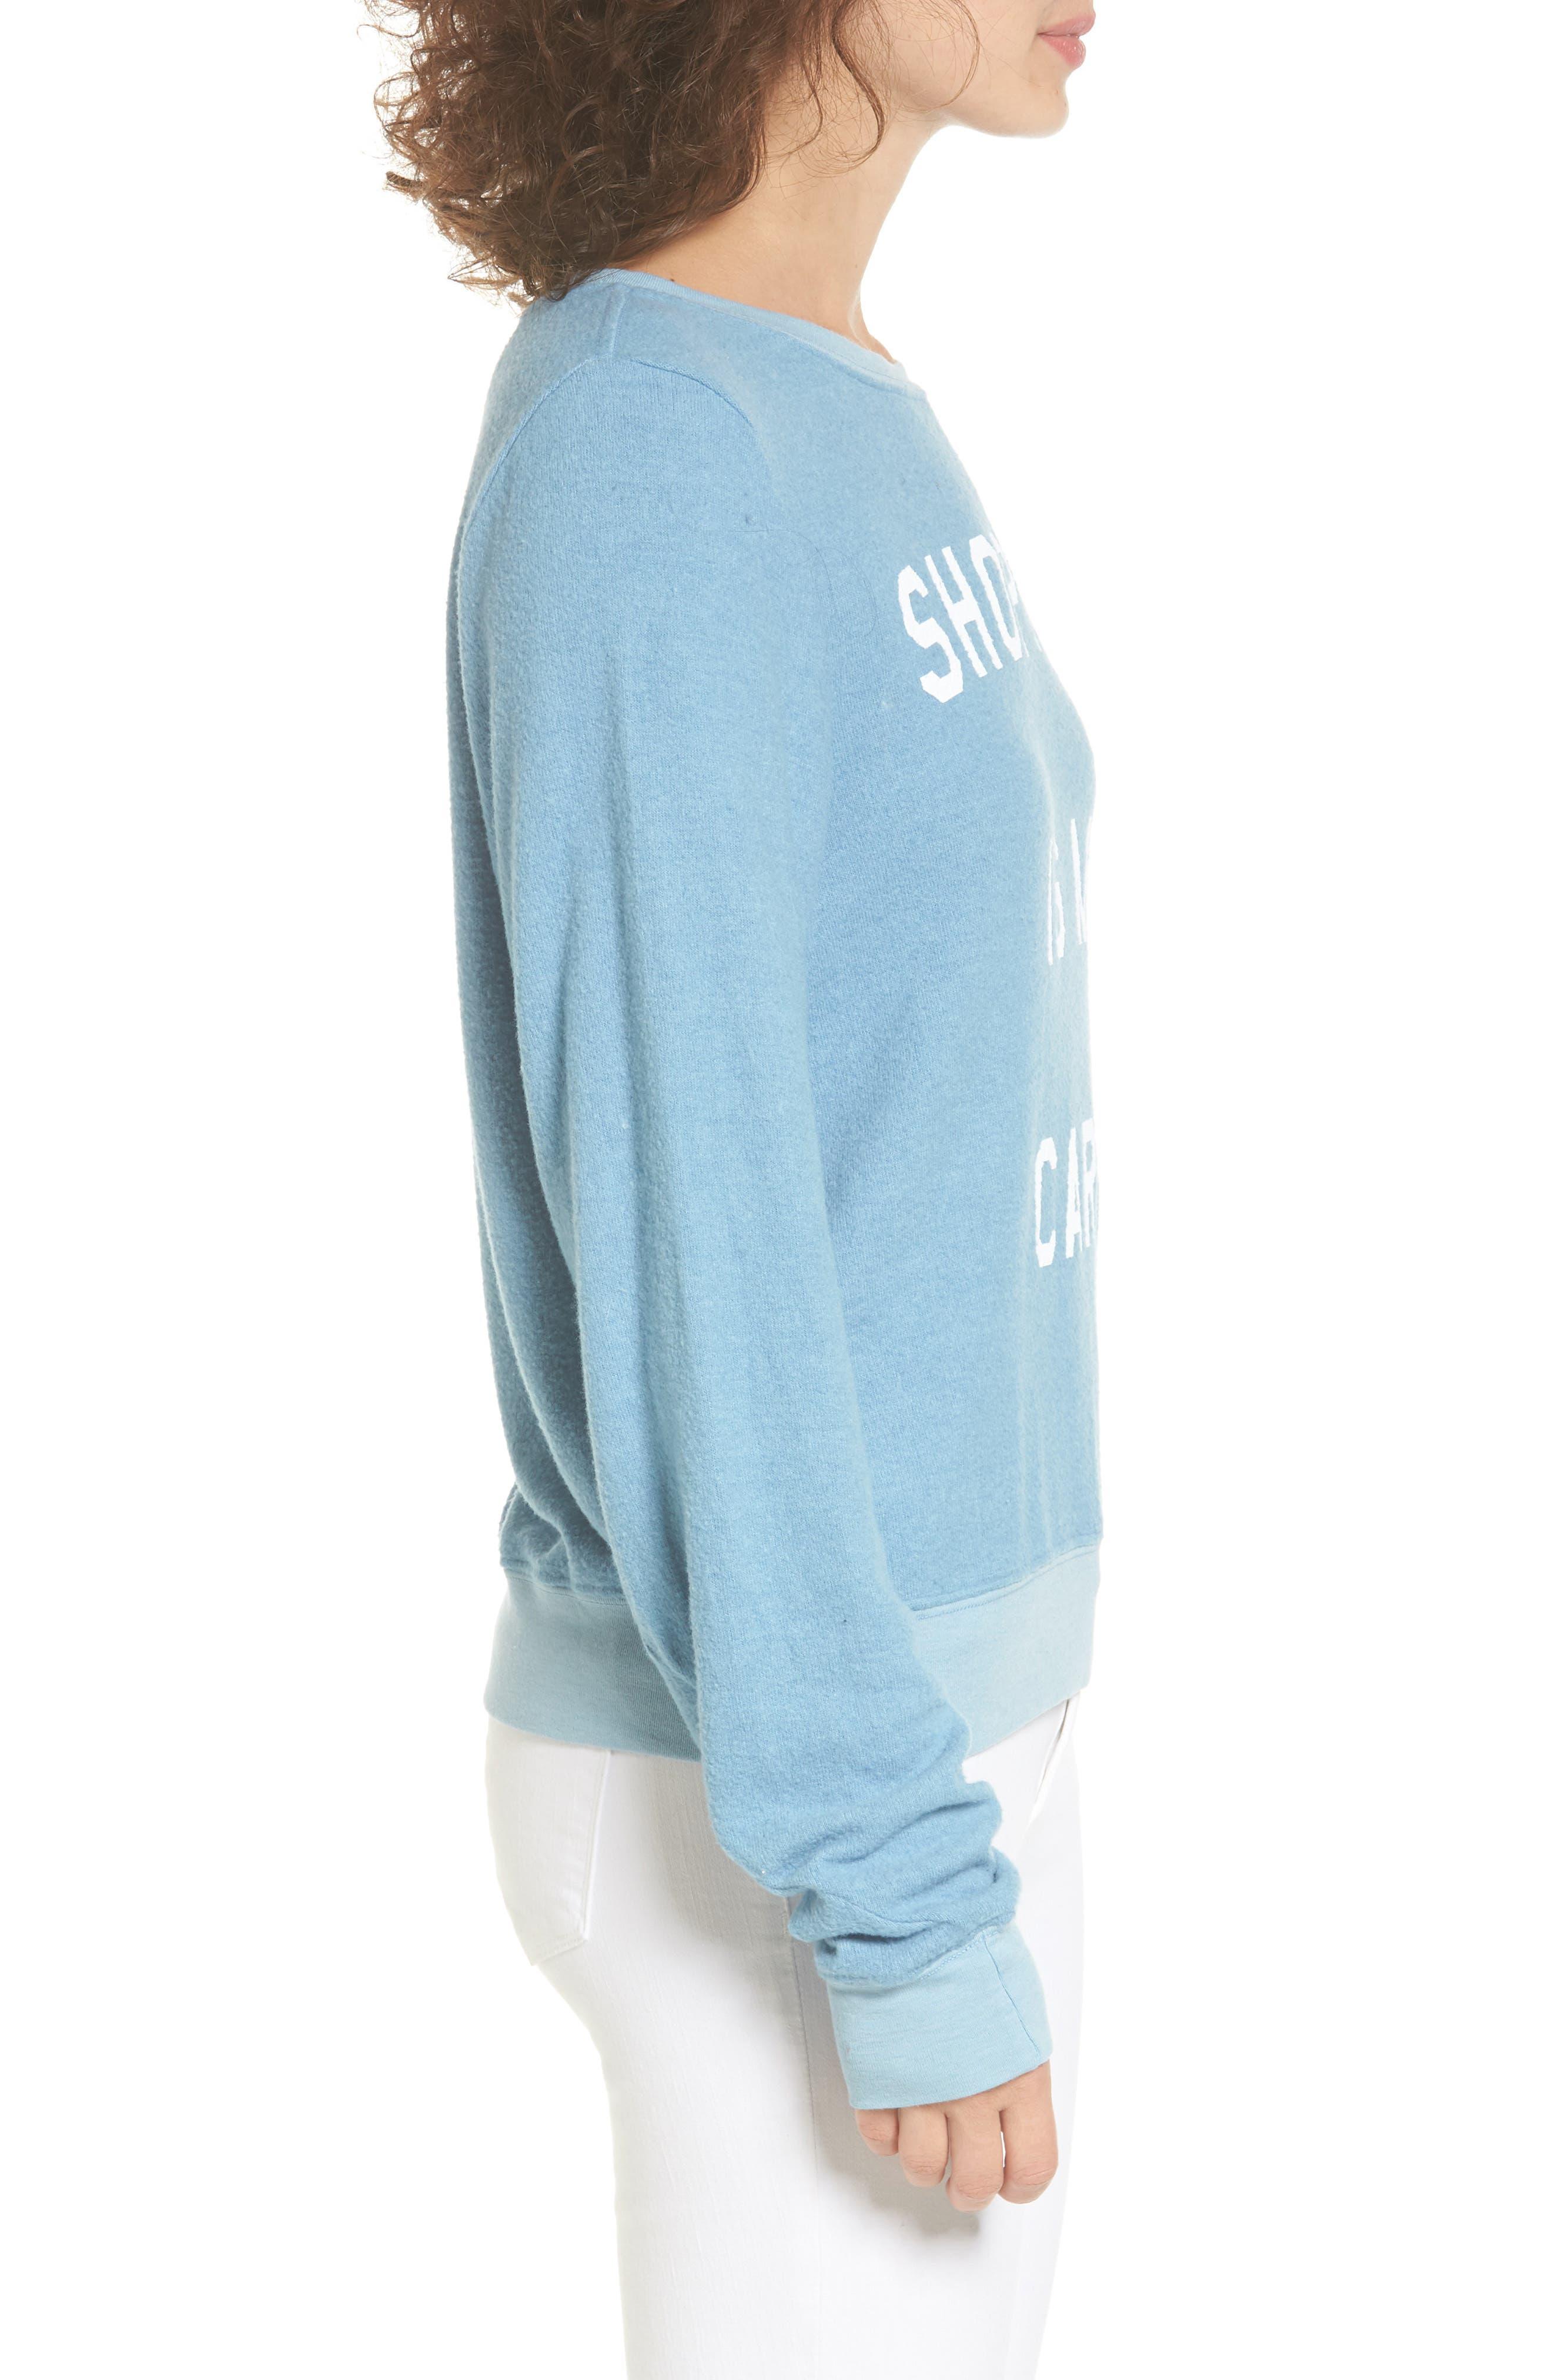 Shopping is My Cardio Sweatshirt,                             Alternate thumbnail 3, color,                             400